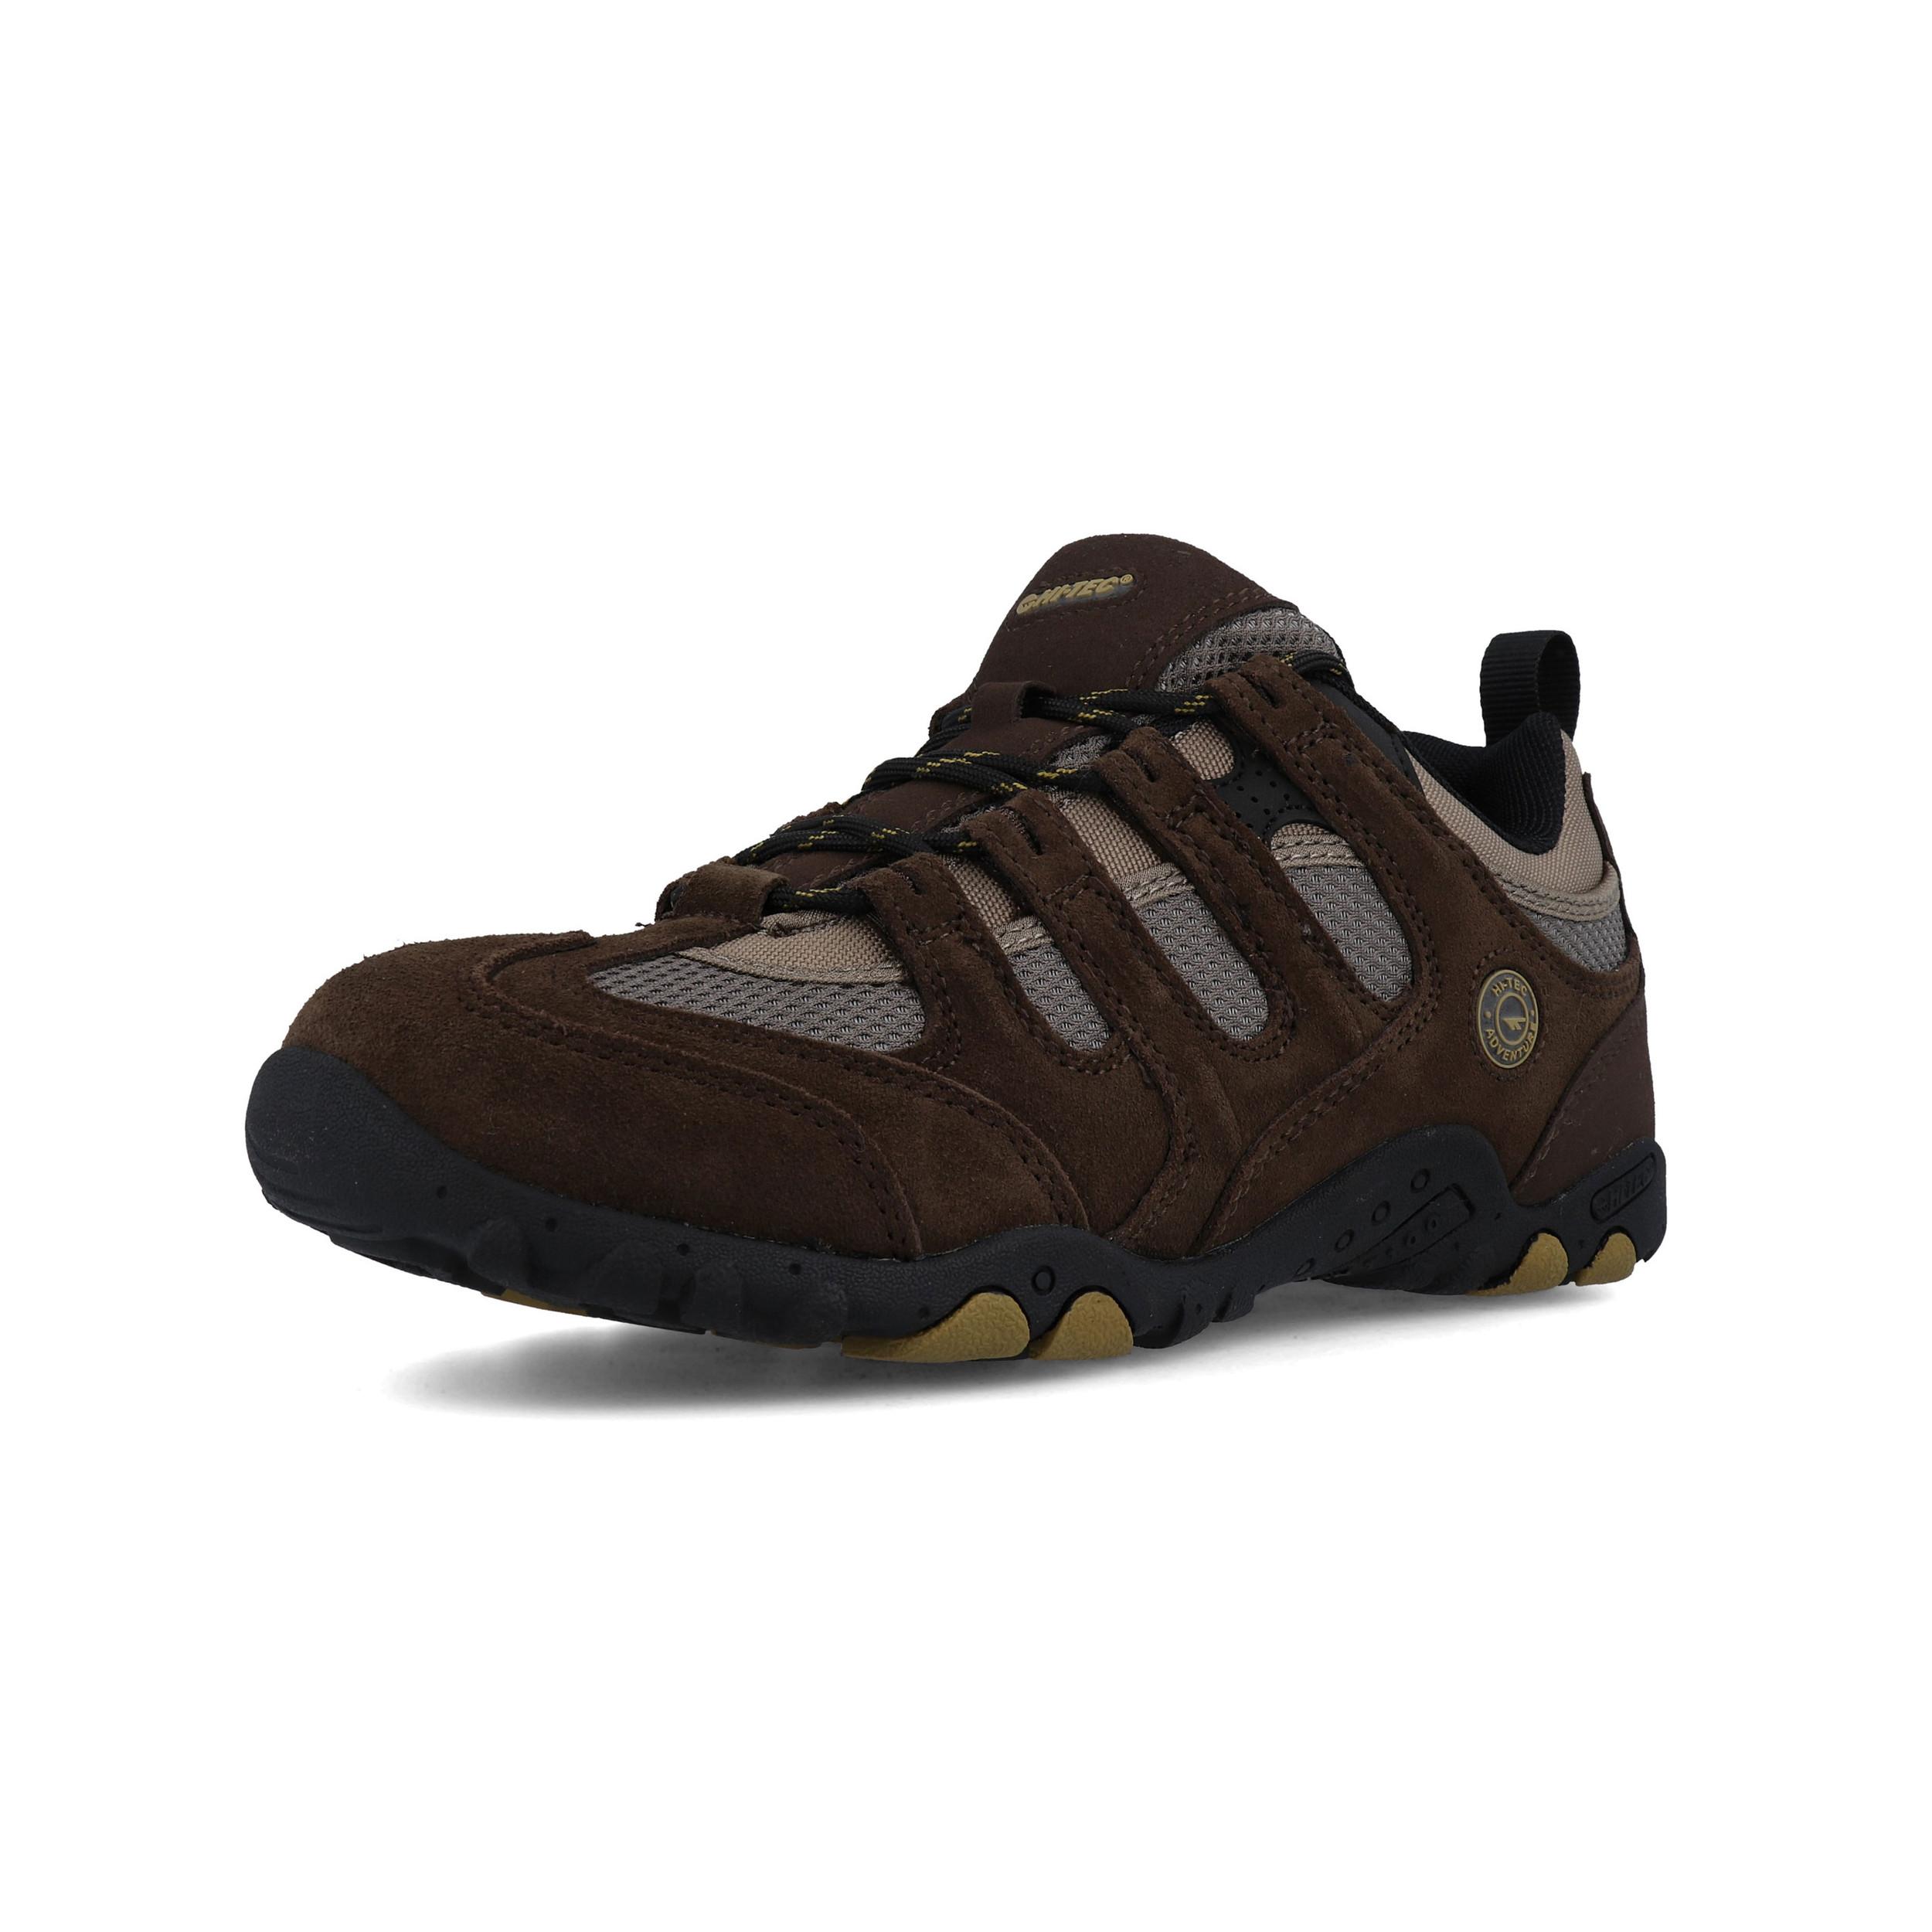 Hi-Tec Mens Quadra Classic Walking Shoes Brown Sports Outdoors Breathable Suede